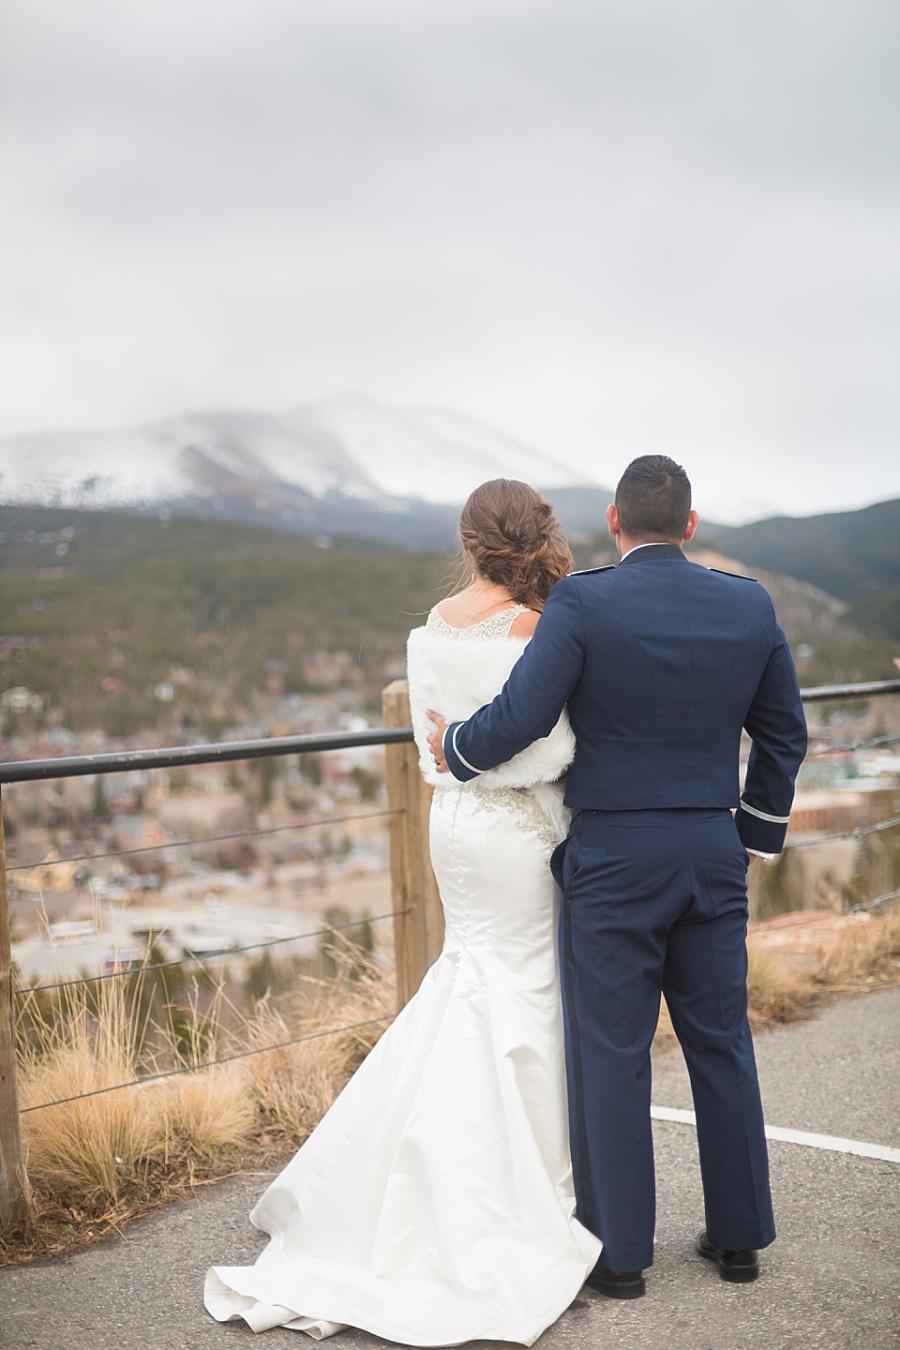 Stacy Anderson Photography Breckenridge Denver Boulder Vail Colorado Travel Lifestyle Elopement Vow renewal Family Wedding Photographer_0028.jpg